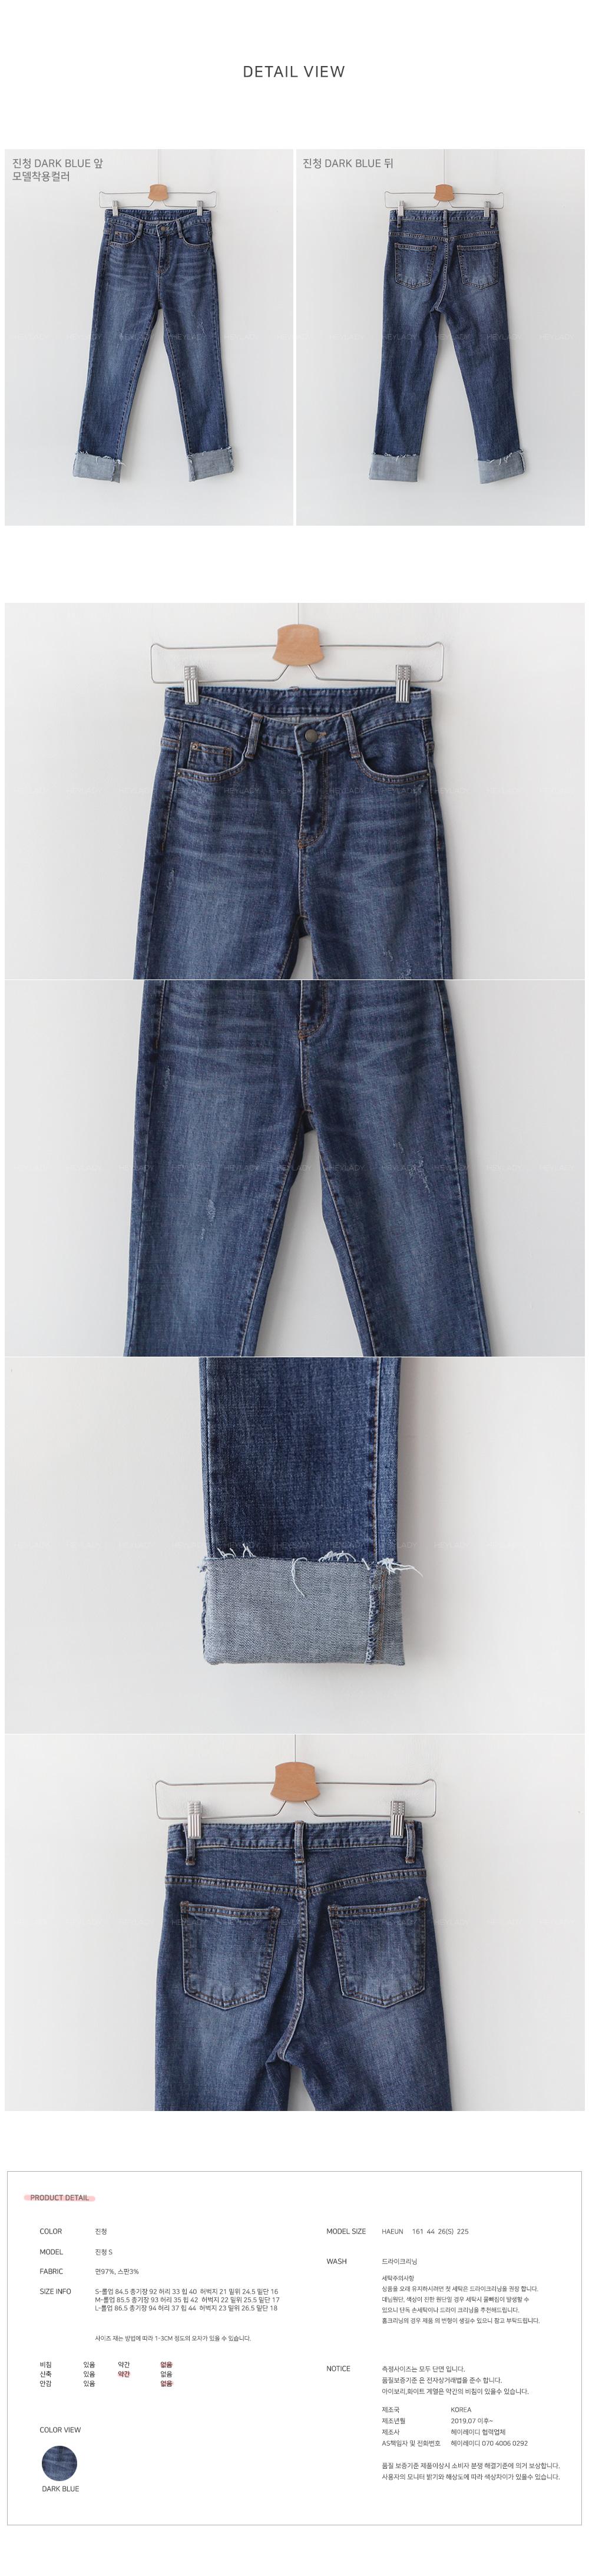 Cami Roll-Up Denim Pants